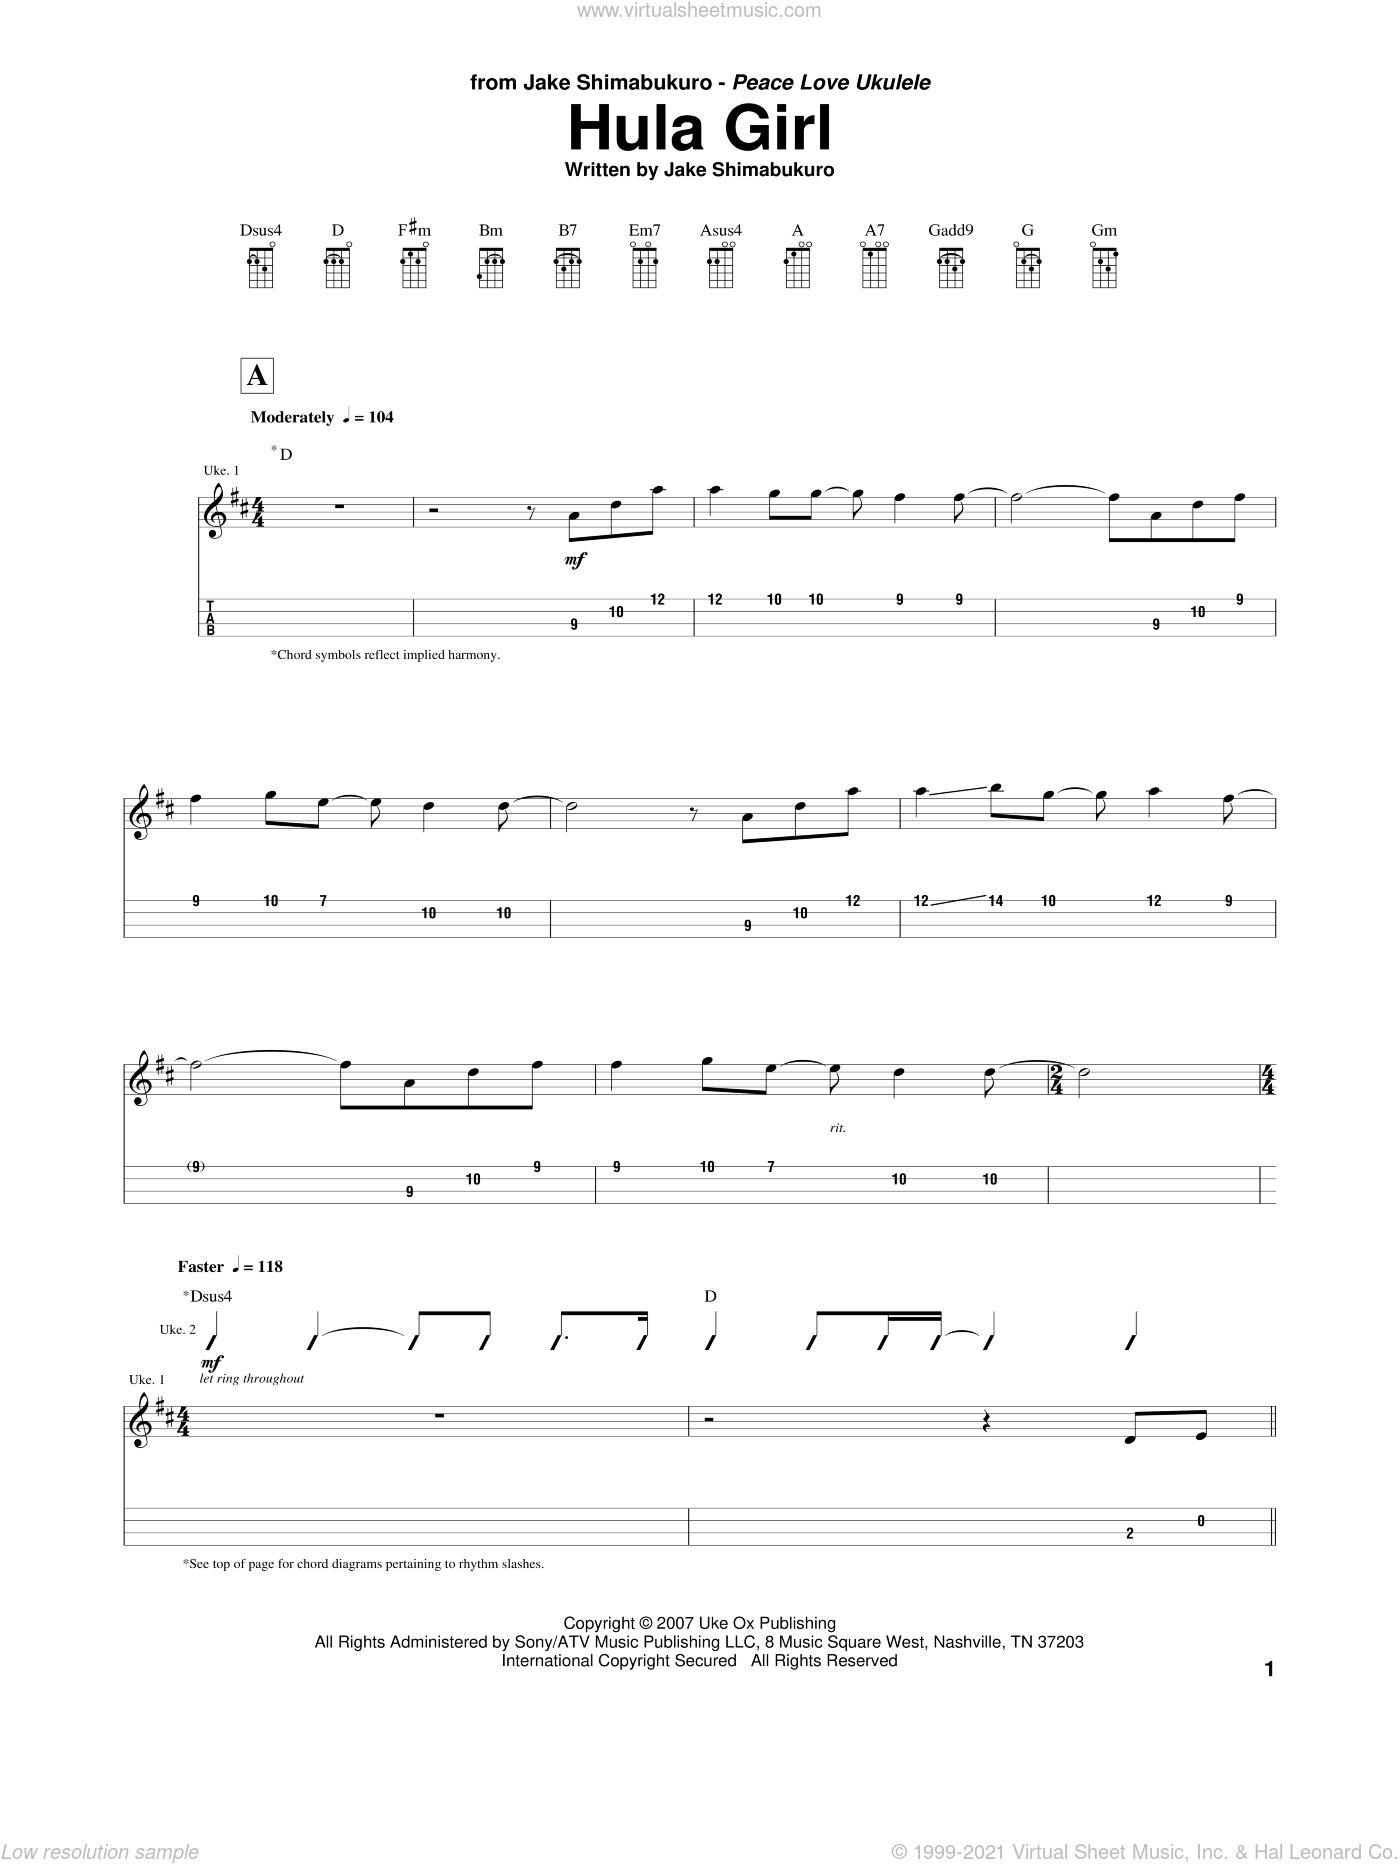 Hula Girl sheet music for ukulele by Jake Shimabukuro, intermediate skill level